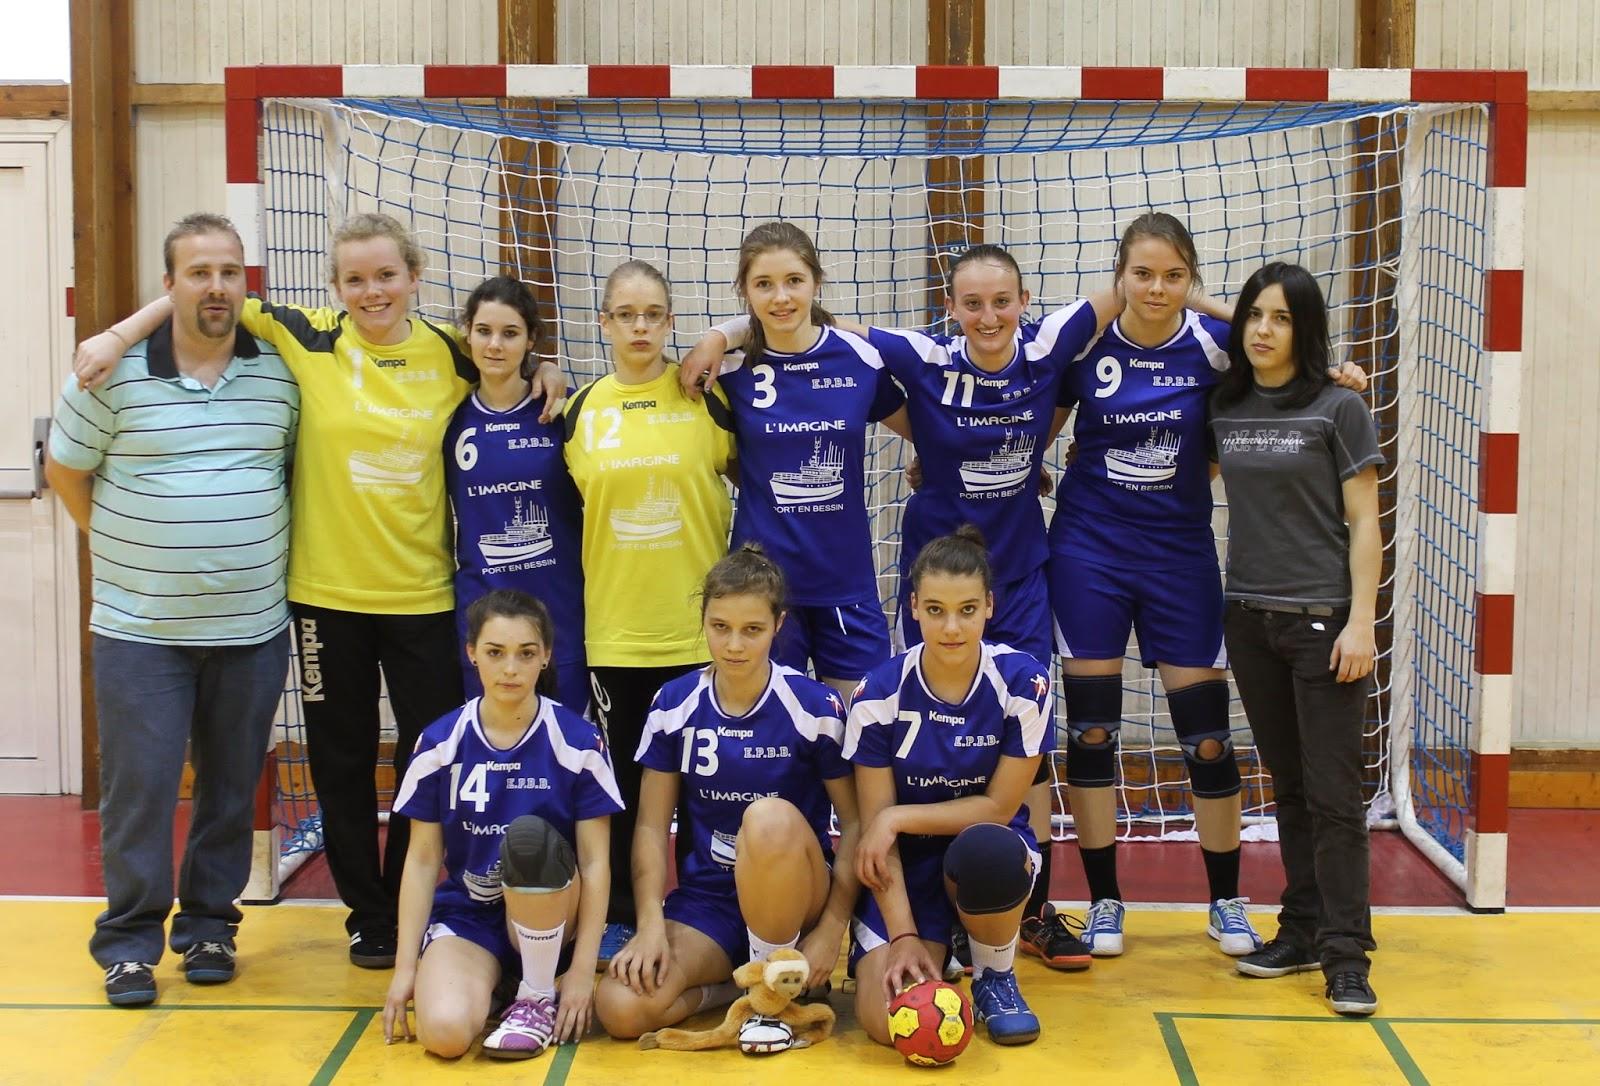 Entente port bayeux bessin handball 16 f minines for Intersport cherbourg